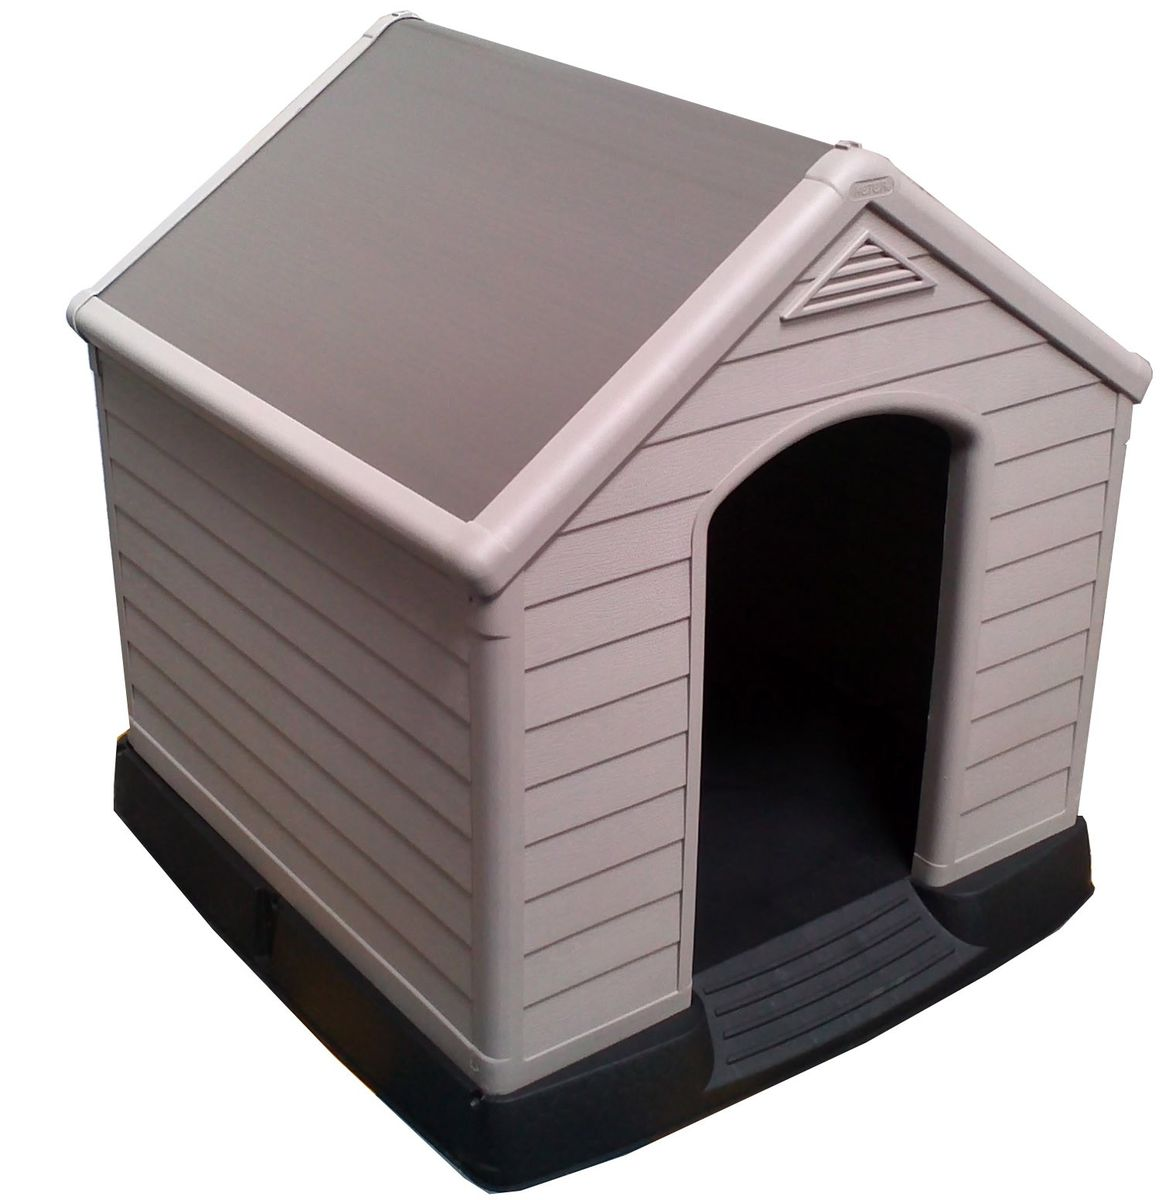 Keter Kennel Dog House